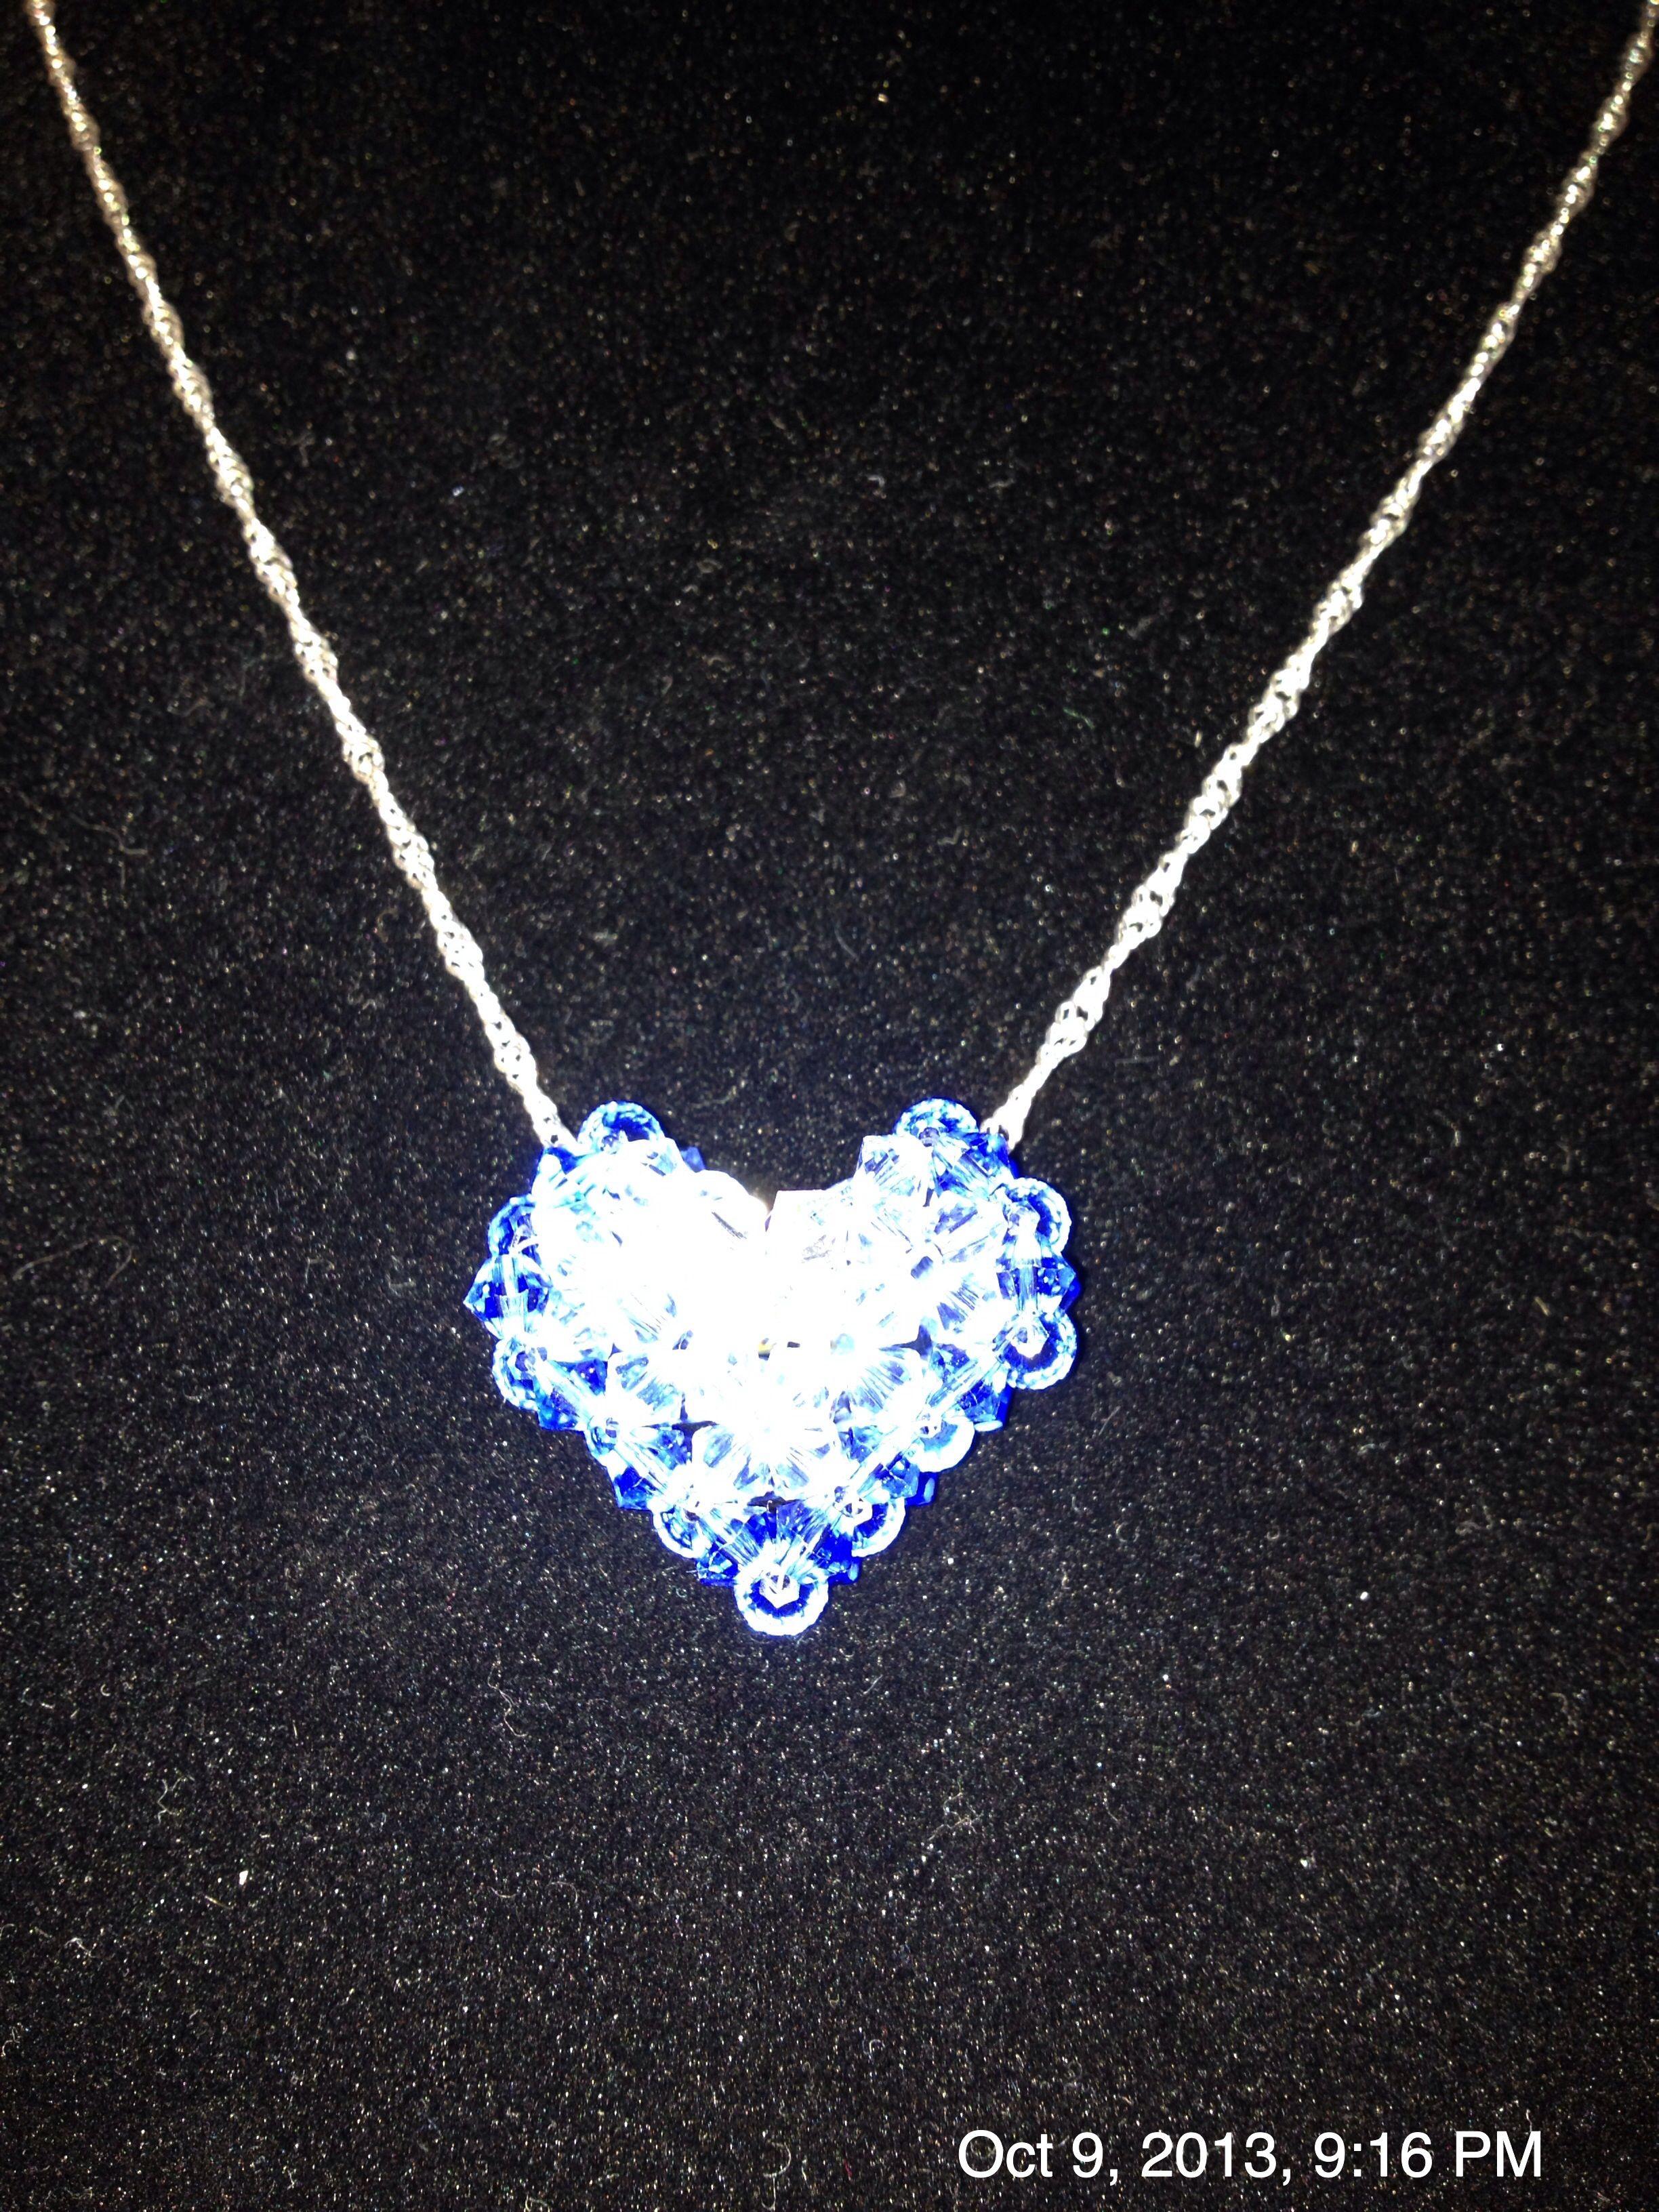 Swarovski crystals.Dark blue to light blue to crystal center